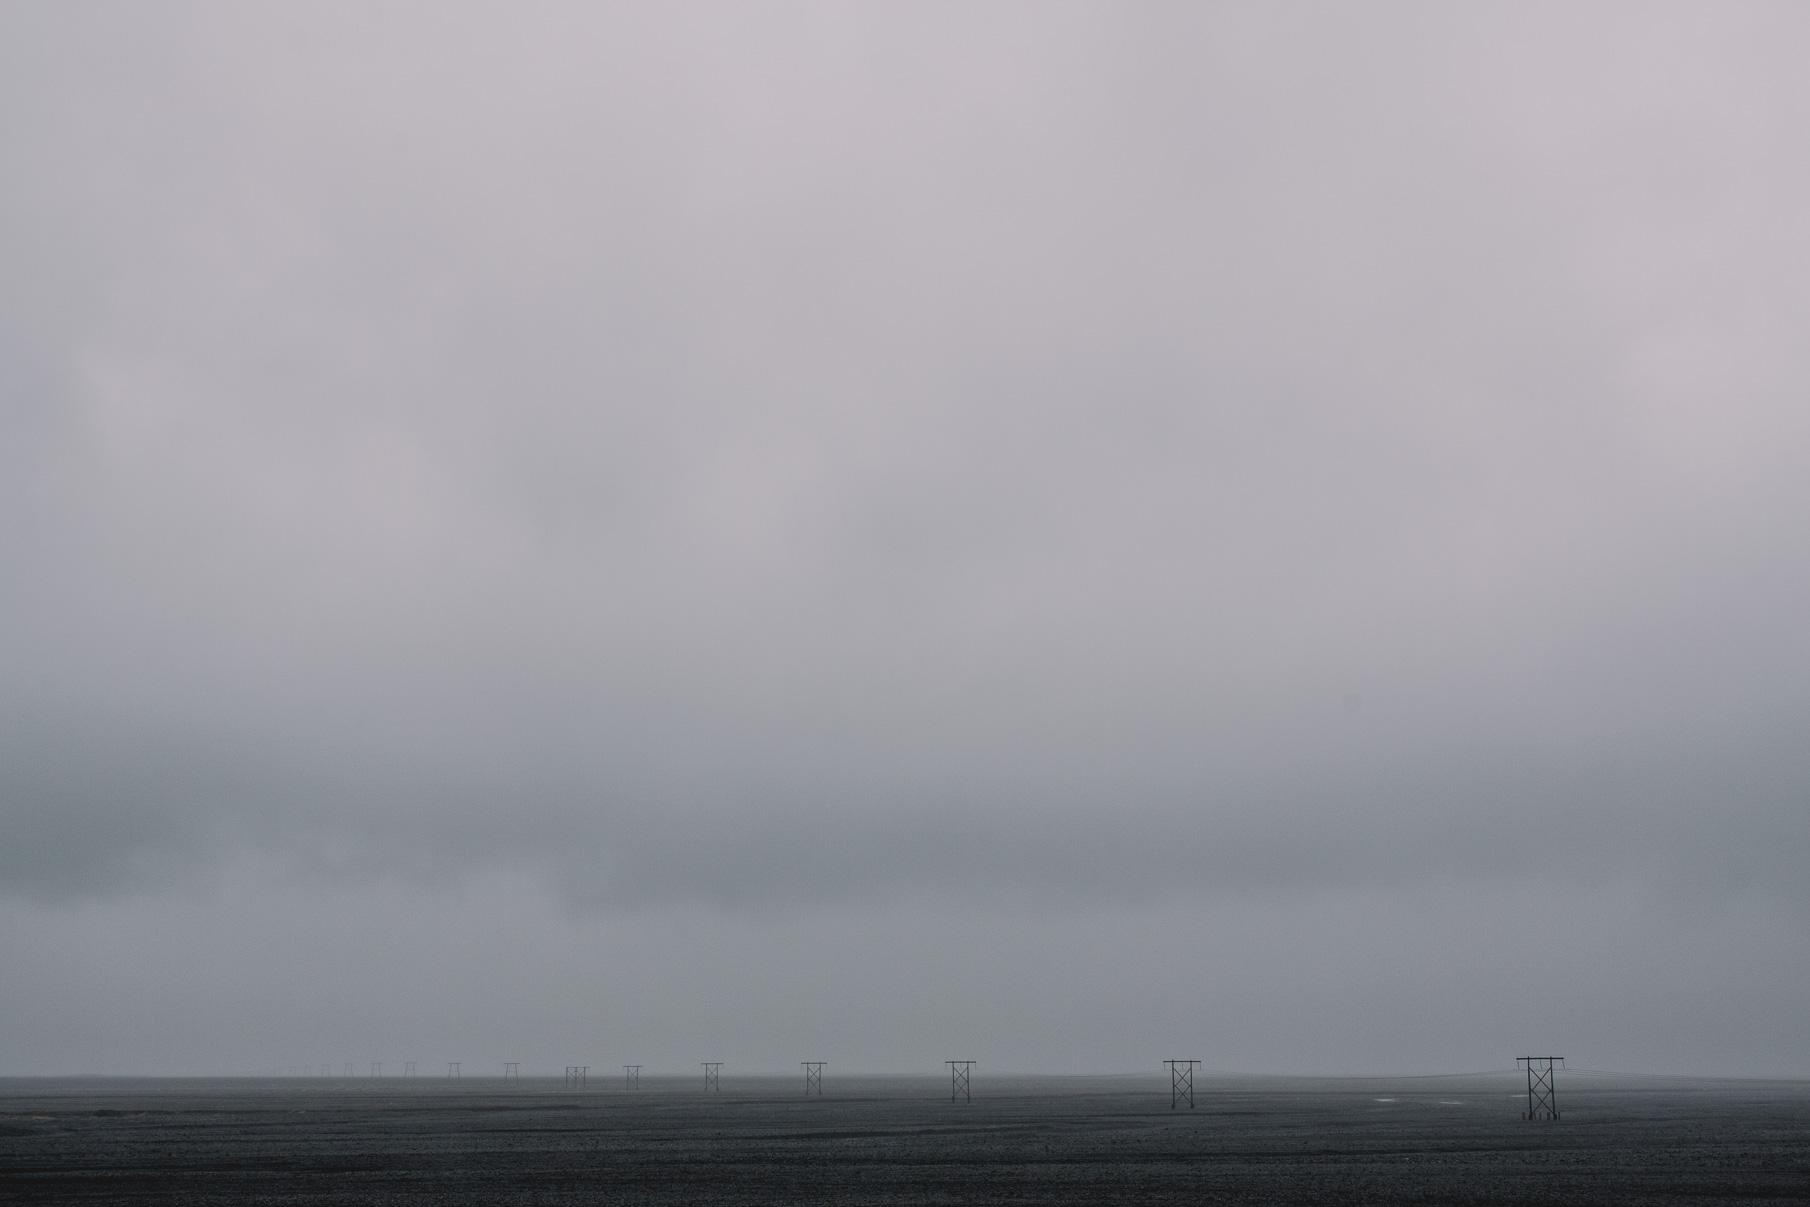 pylons-001_o.jpg